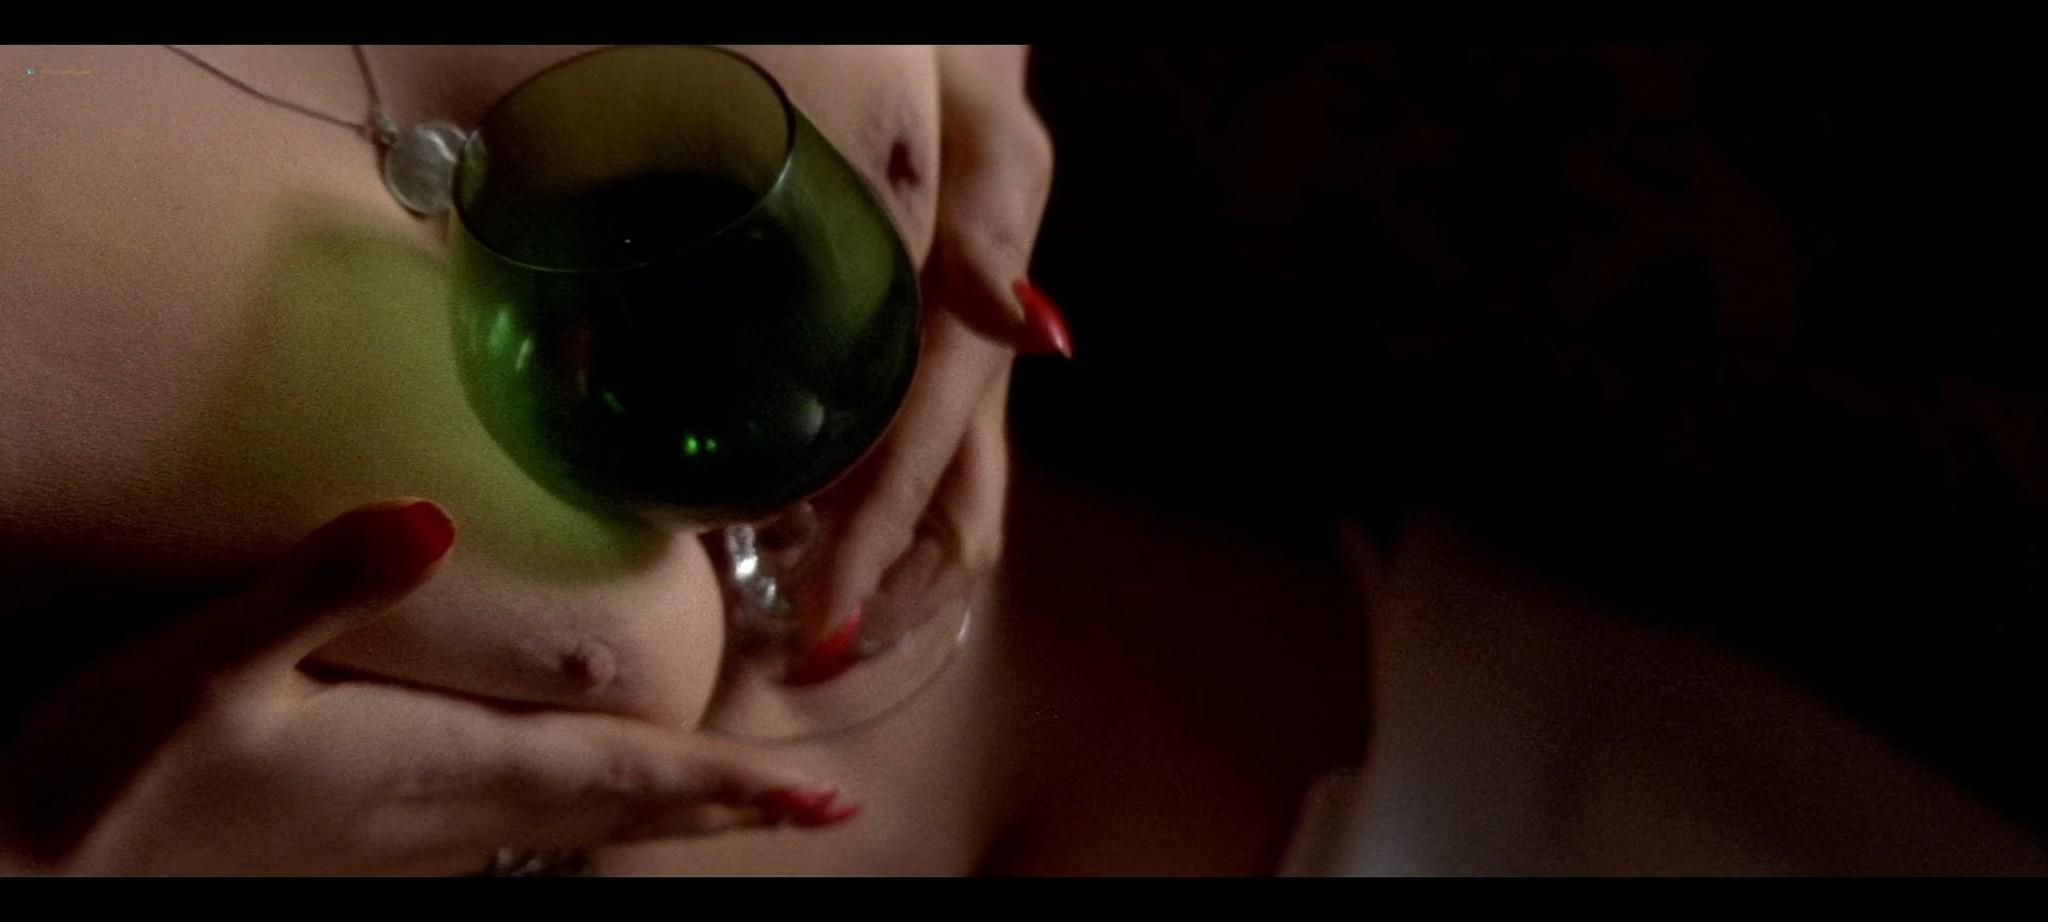 Hidemi Hara nude sex Mari Tanaka and other nude too Love Hunter JP 1972 HD 1080p BluRay REMUX 002